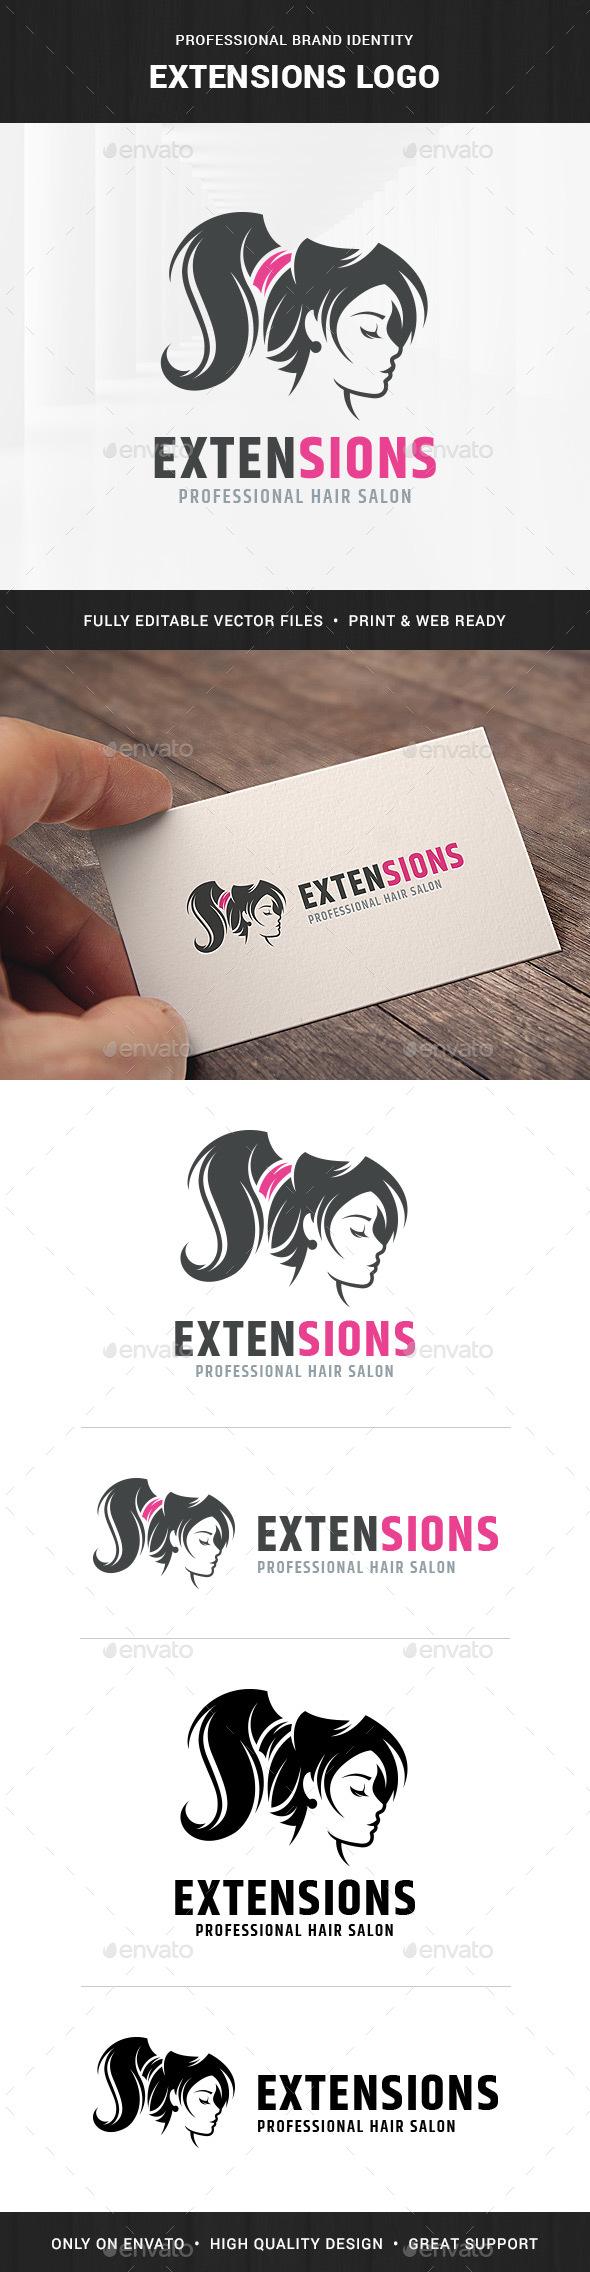 Extensions Hair Salon Logo